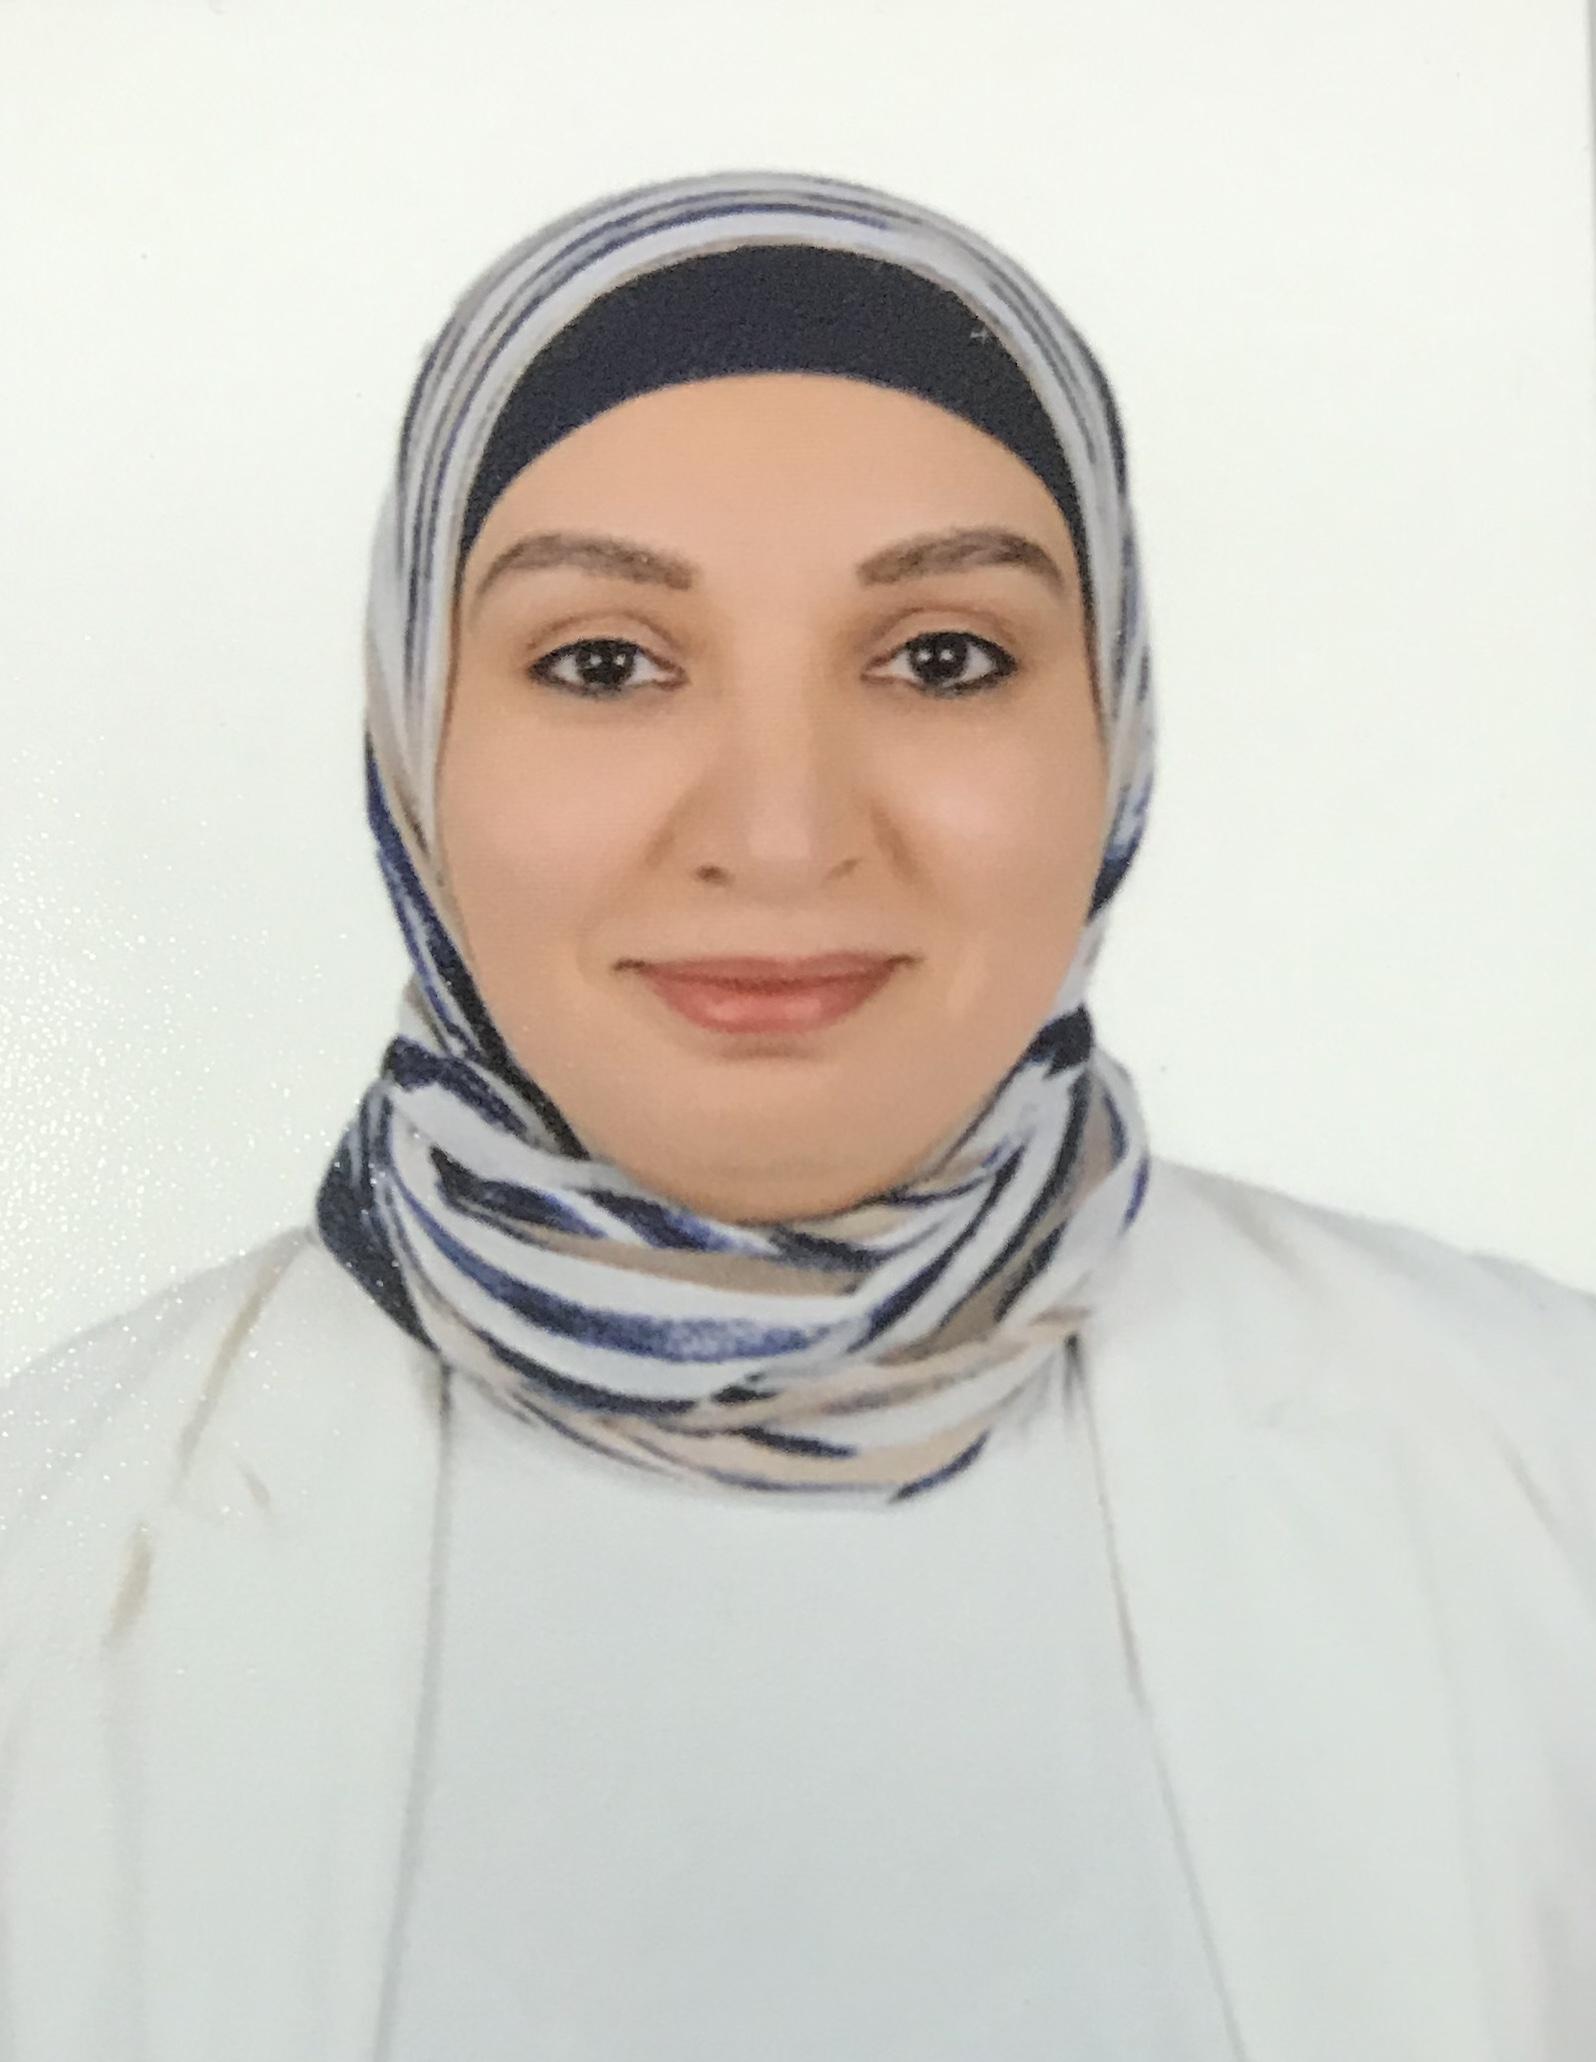 An image of Shymaa Enany